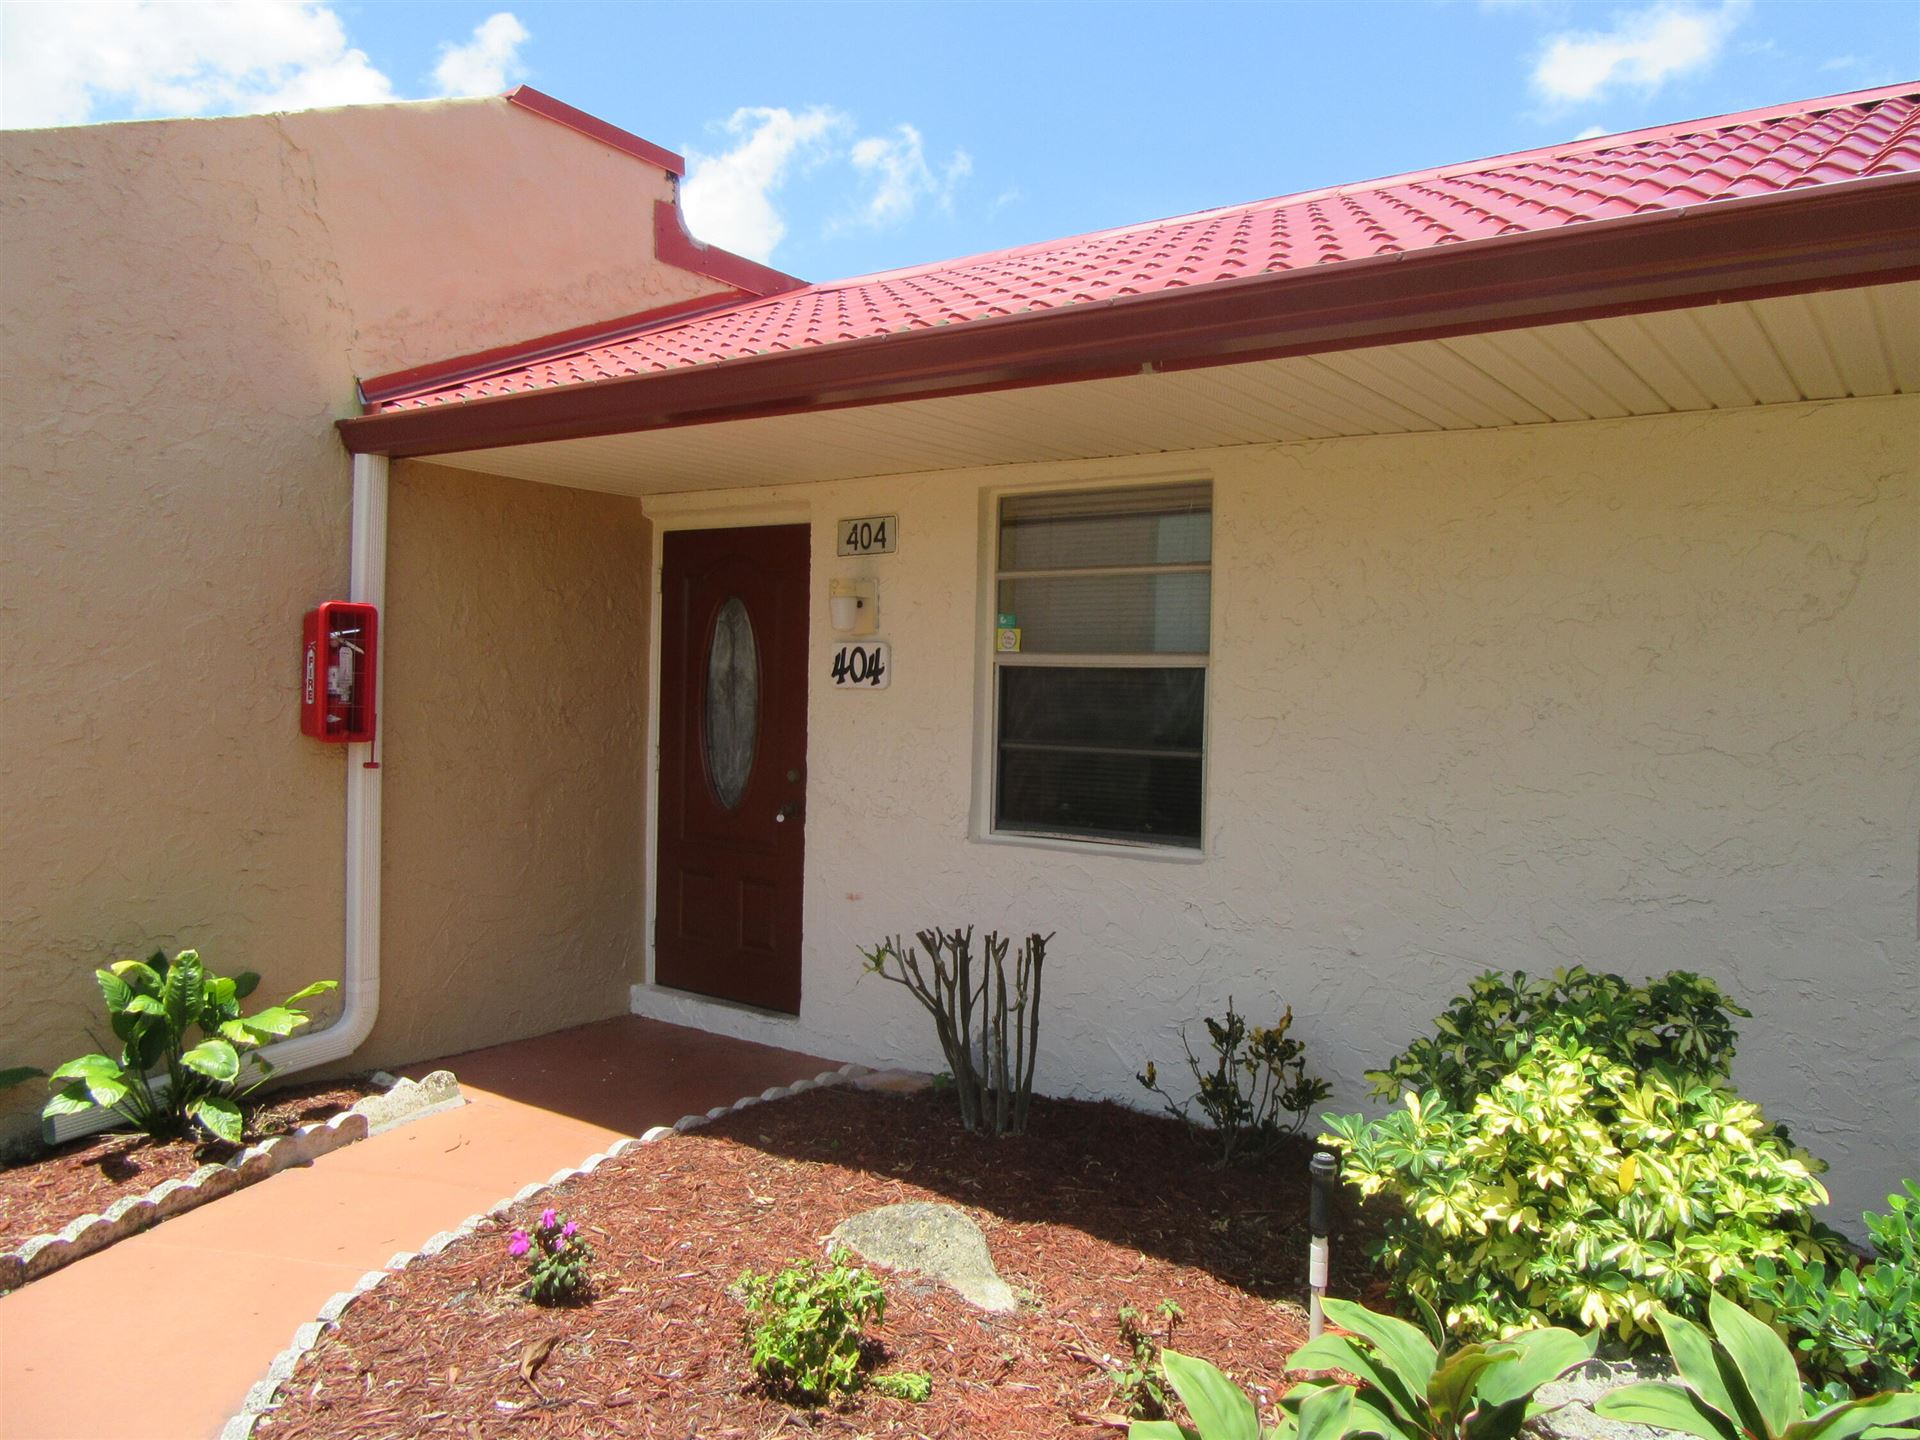 404 Lake Carol Drive, West Palm Beach, FL 33411 - MLS#: RX-10722526